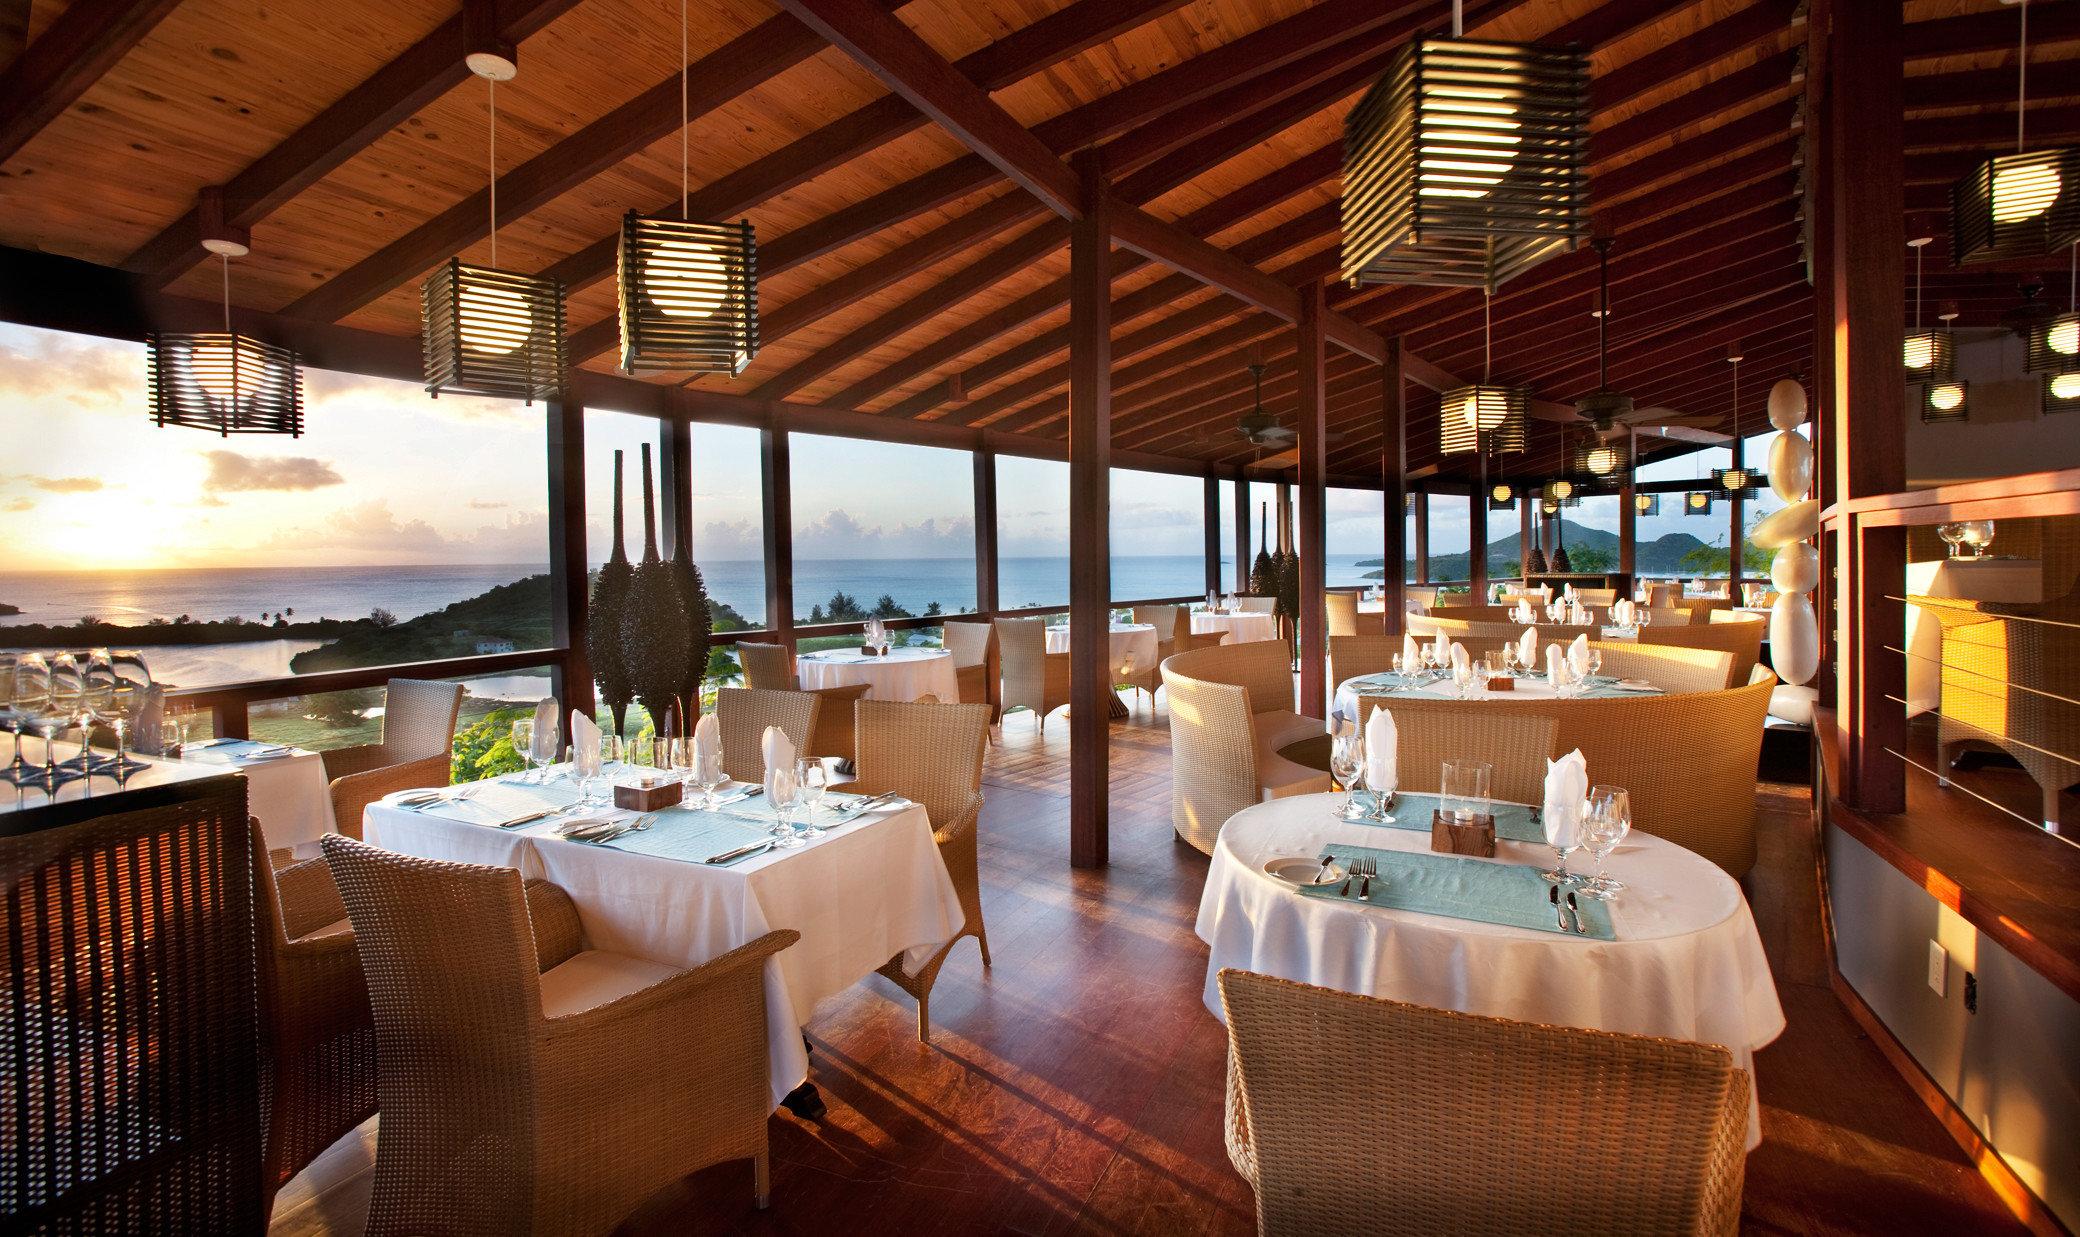 chair restaurant Resort function hall Bar